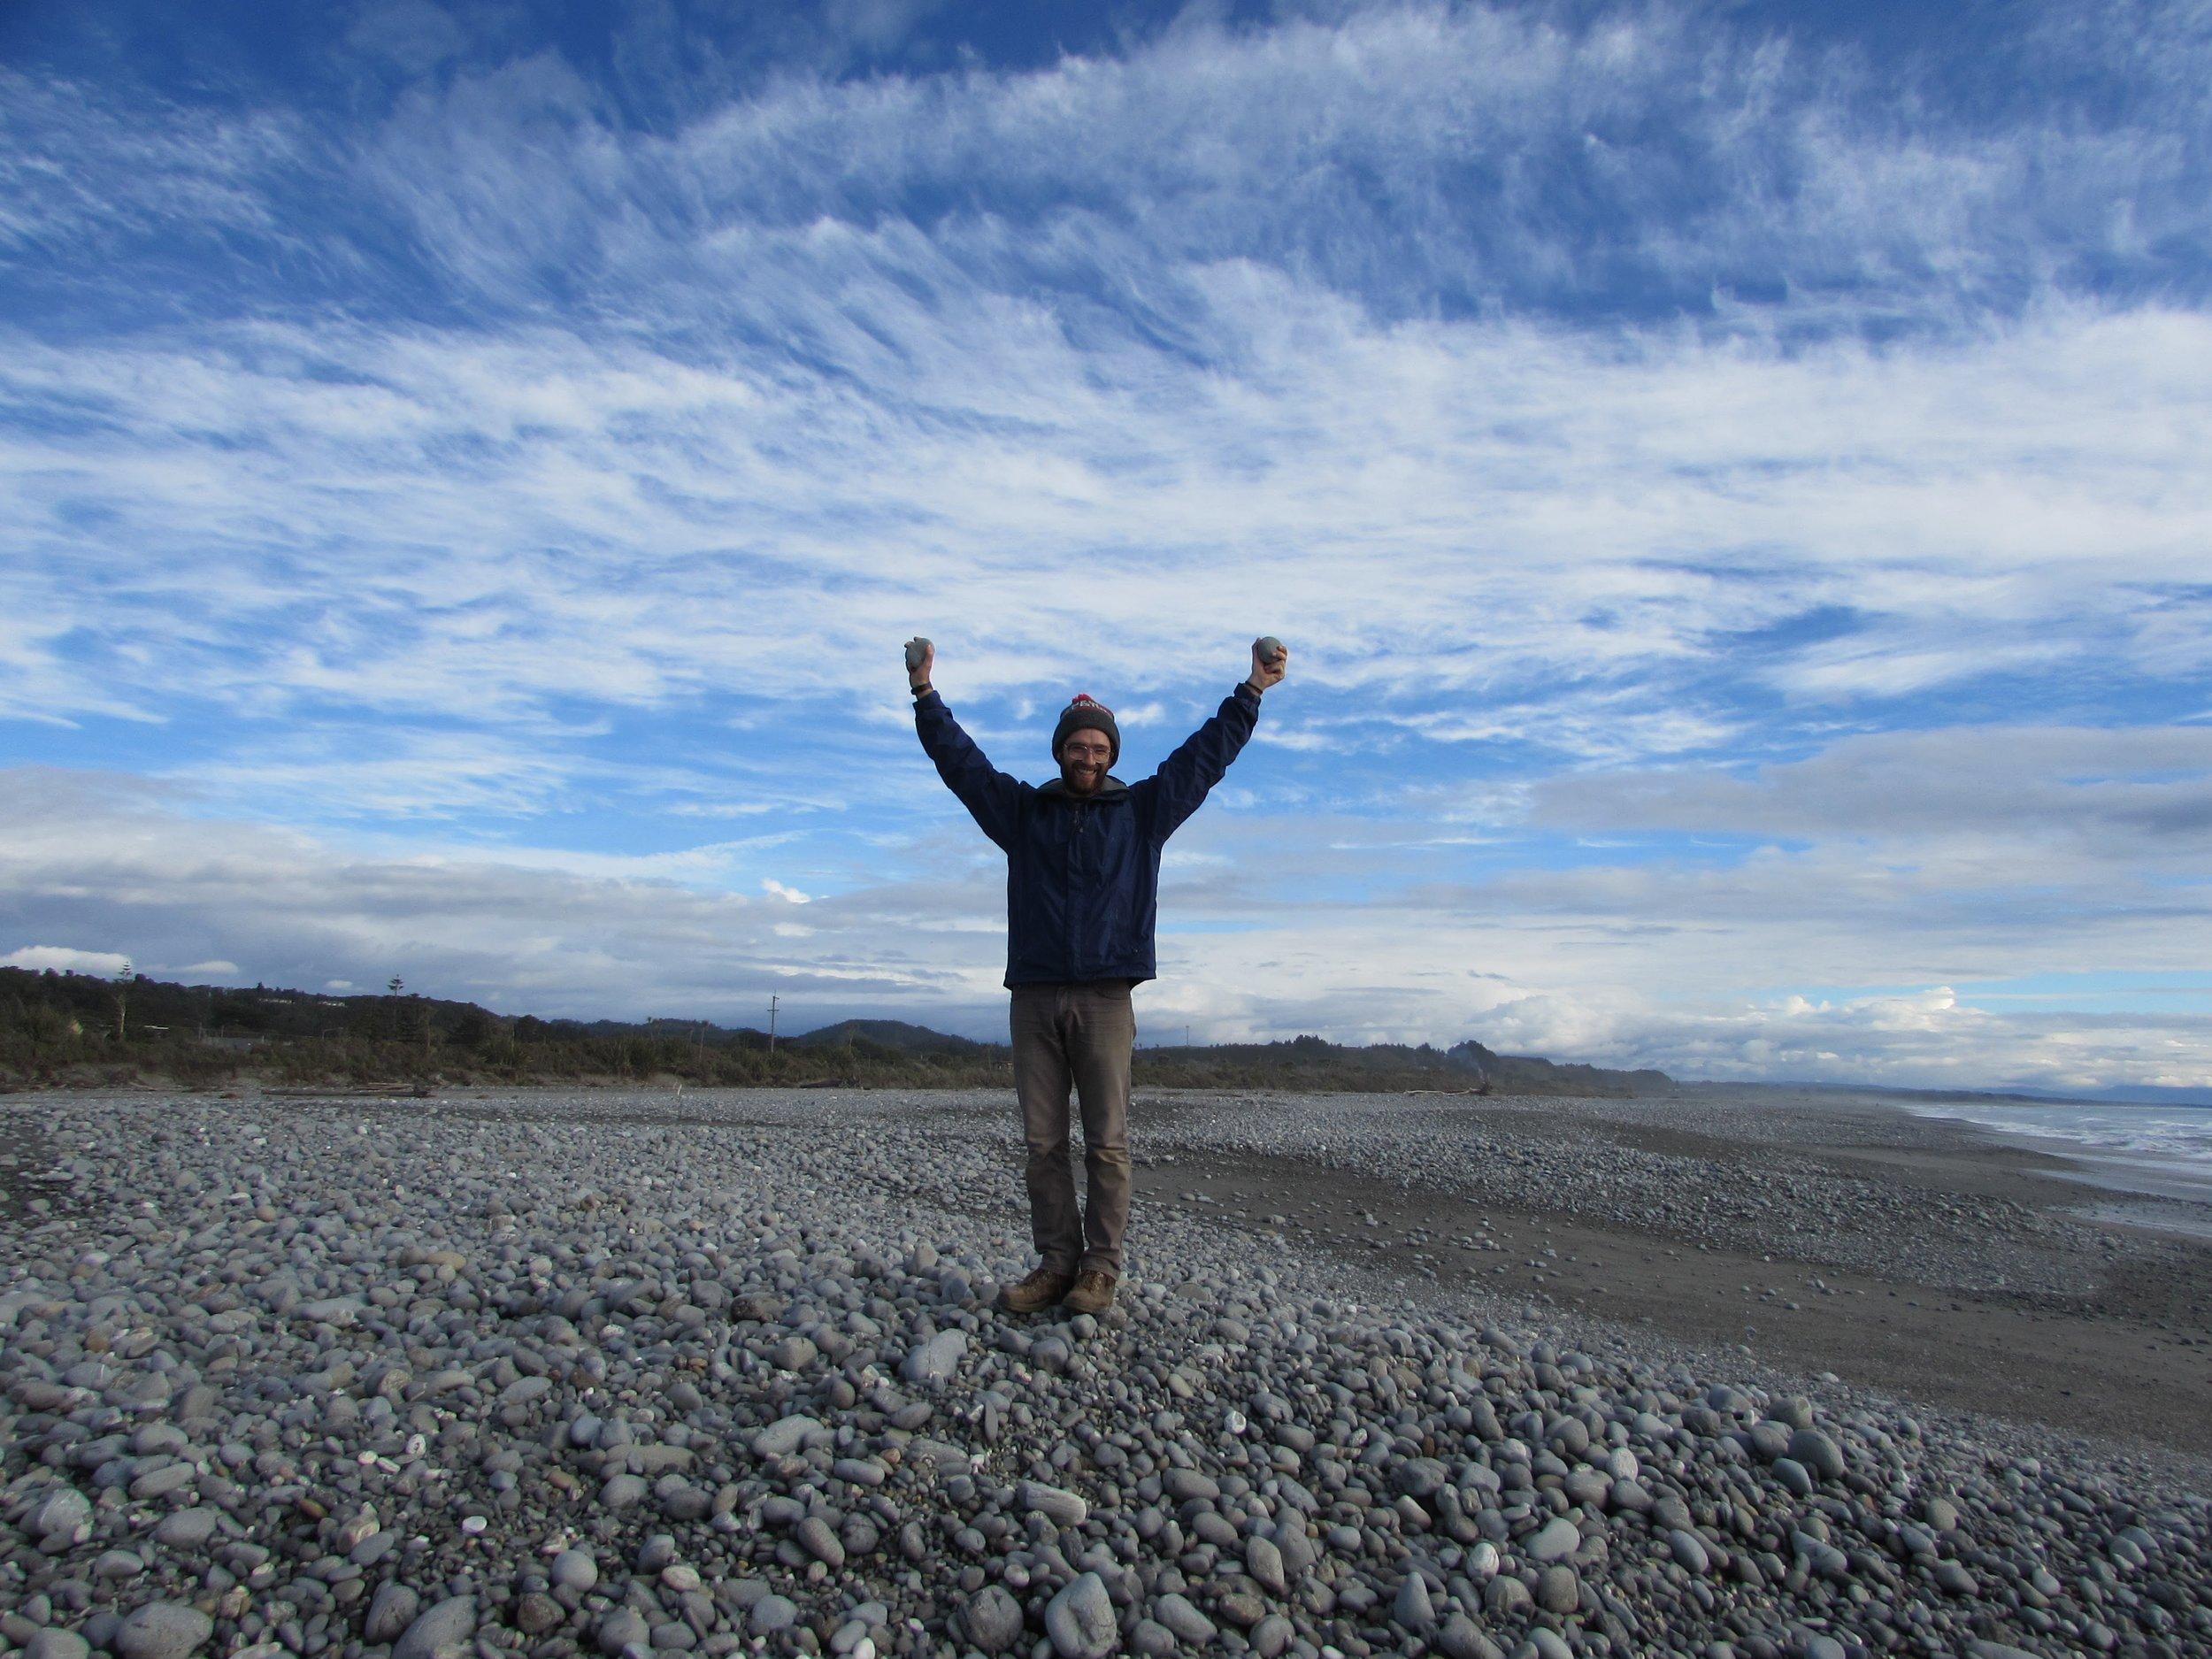 A triumphant Emmett on the rocky beach of Greymouth.